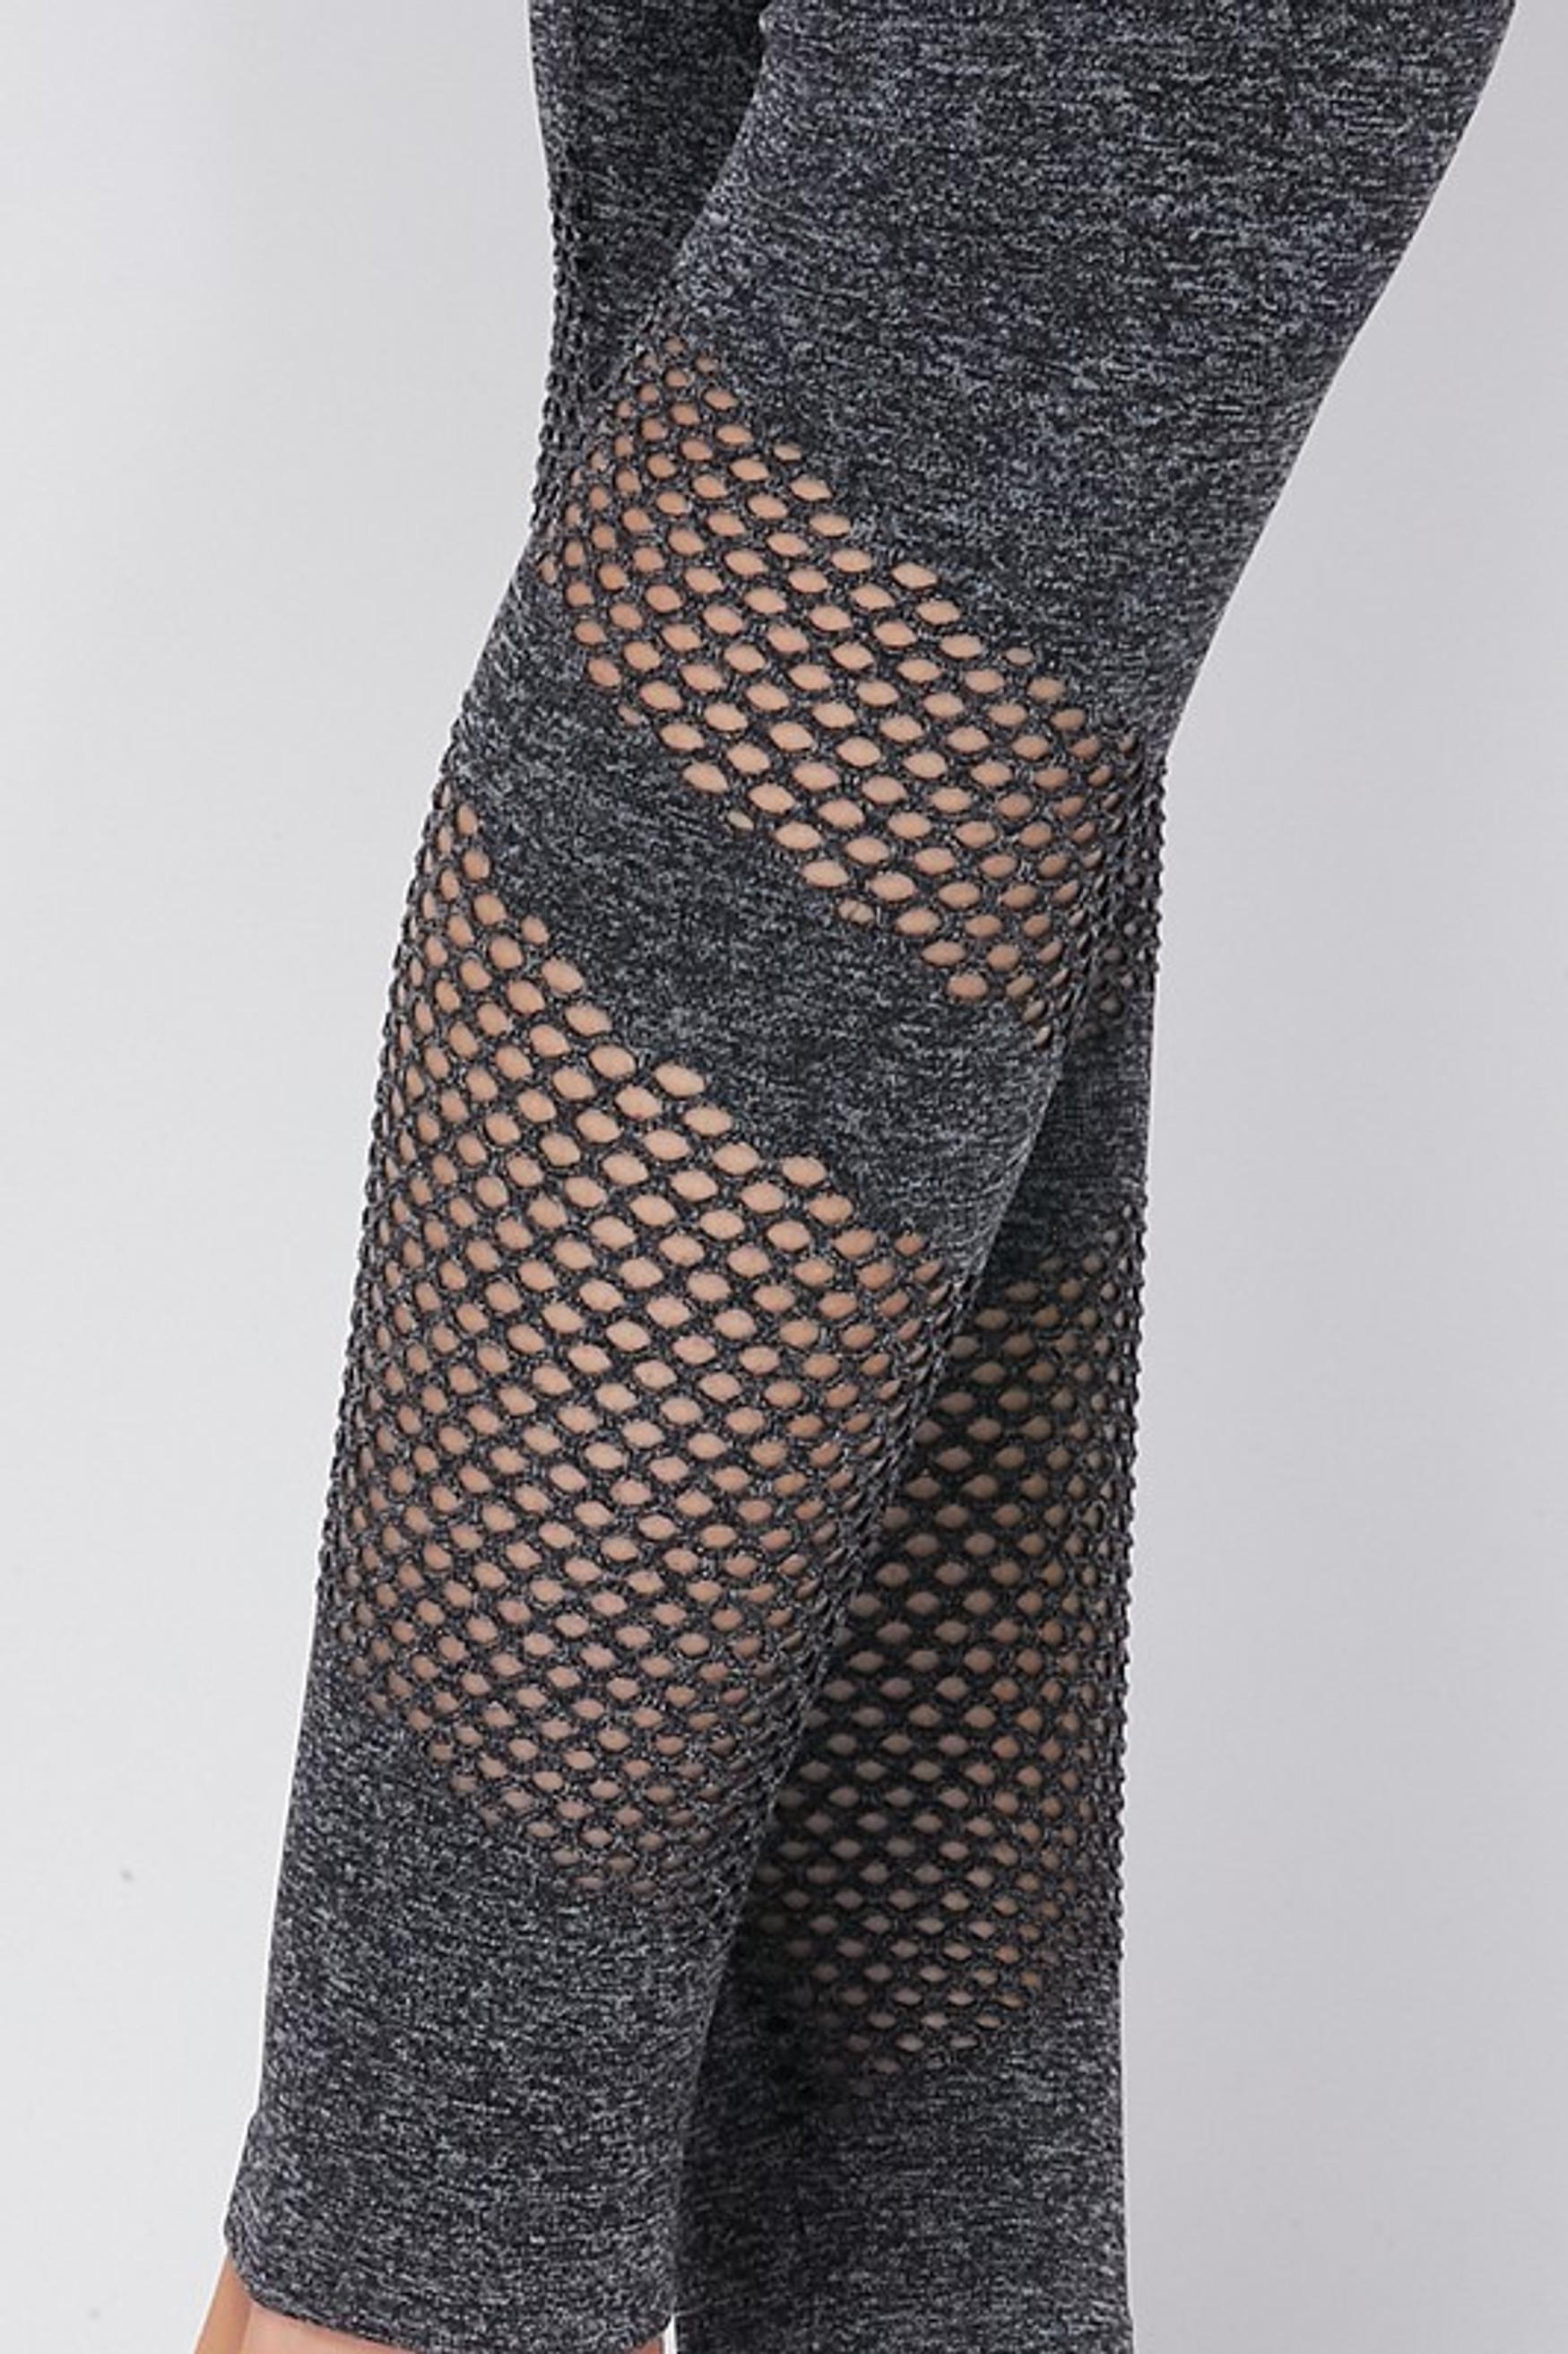 Premium 2 Piece Charcoal Bra Top and Leggings Sport Set